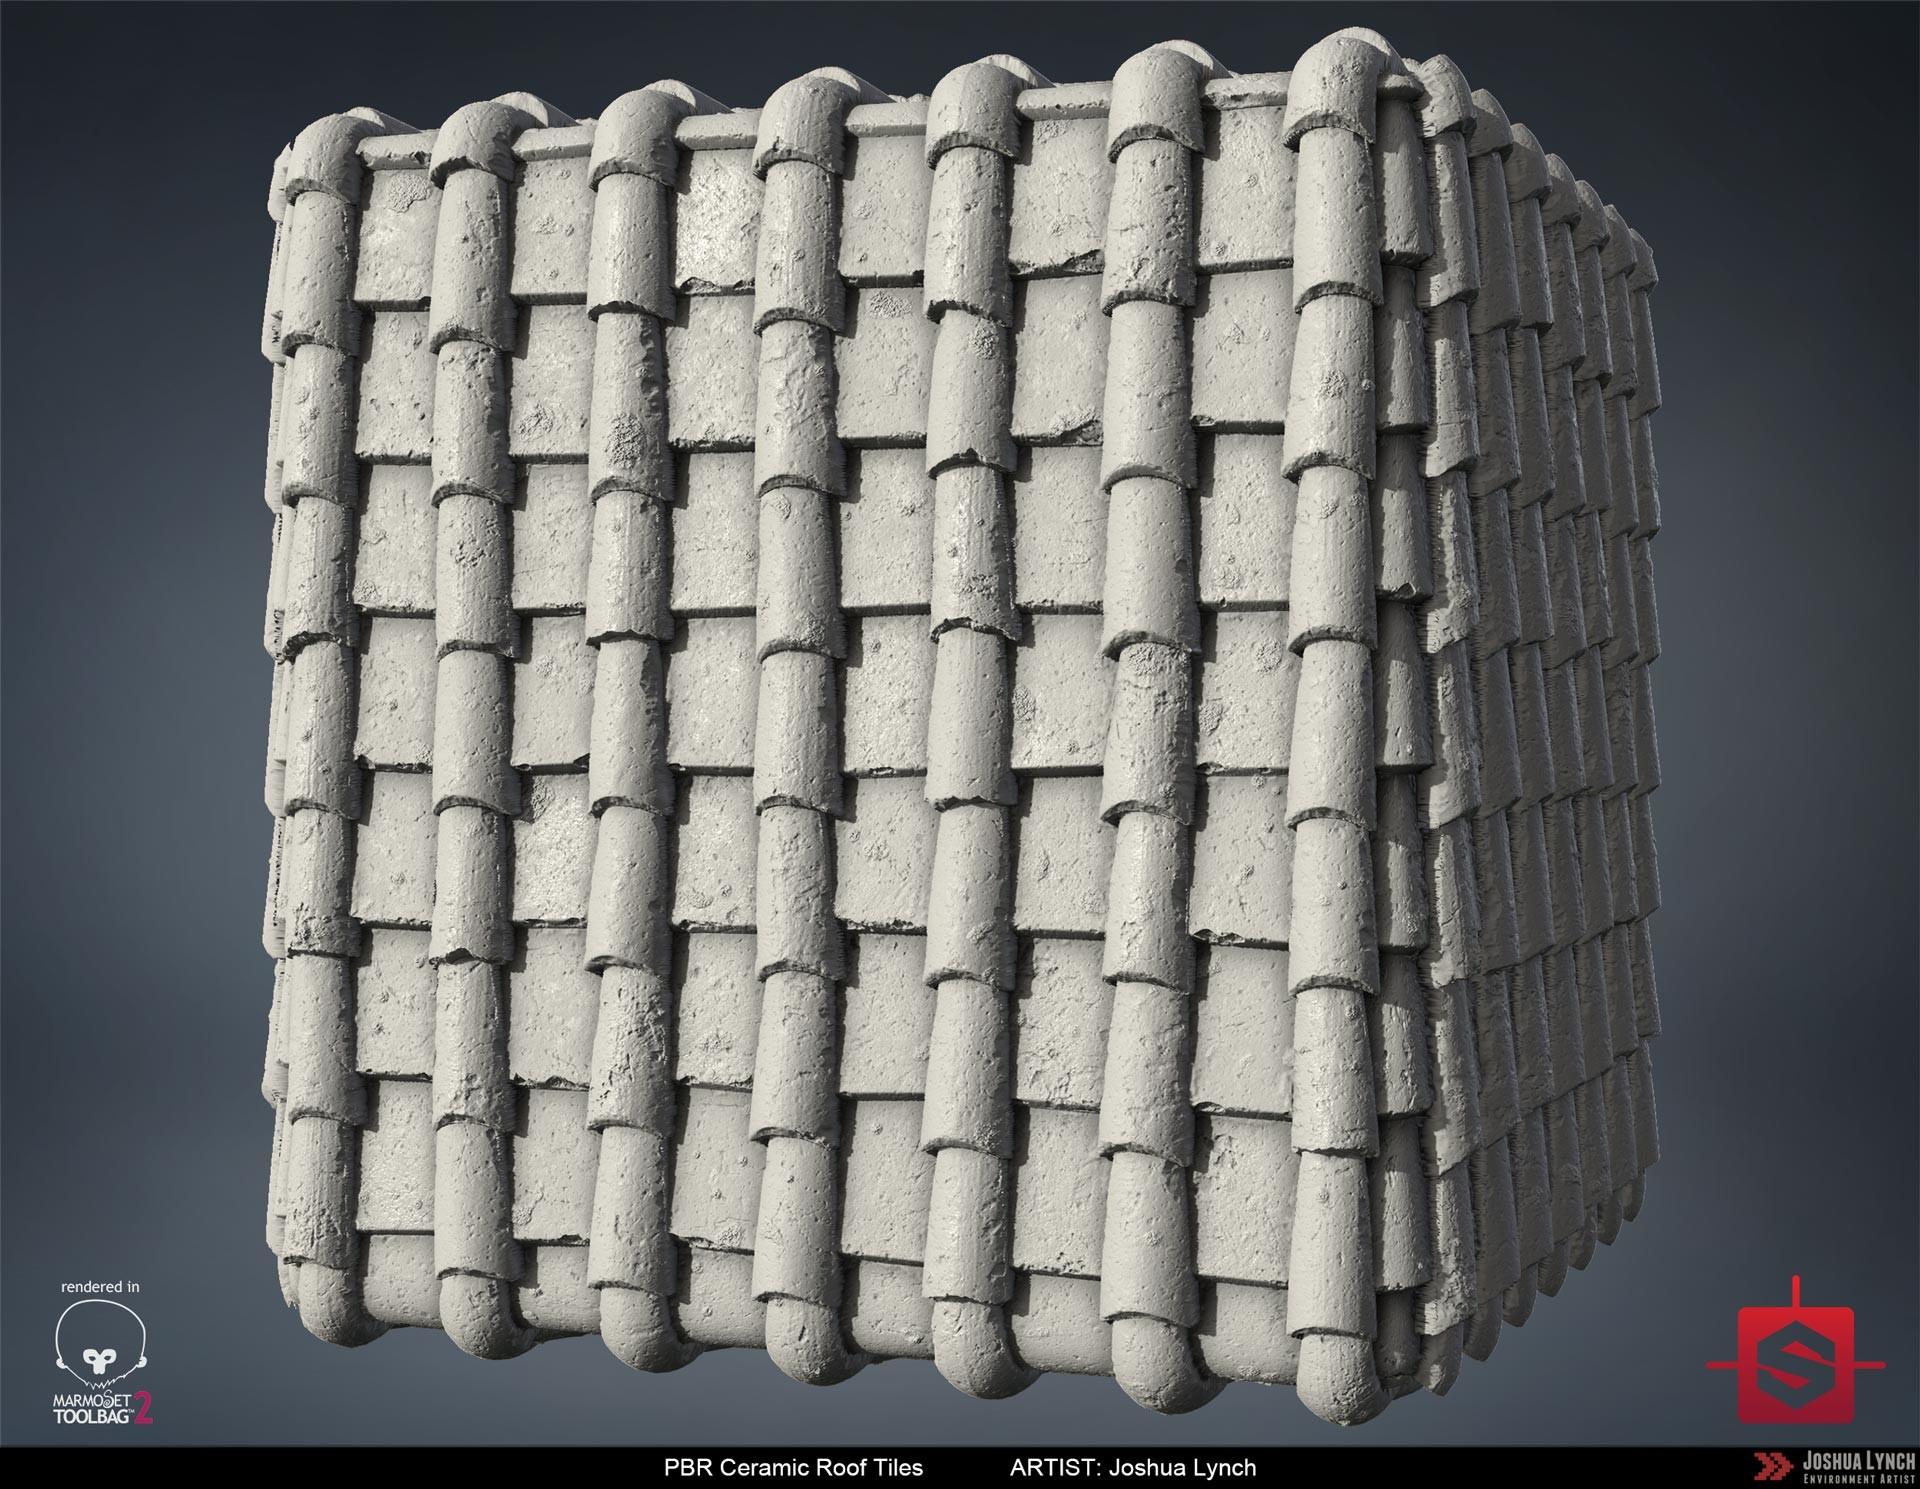 Joshua lynch roofing tiles 02 square rev 03 gray layout comp josh lynch